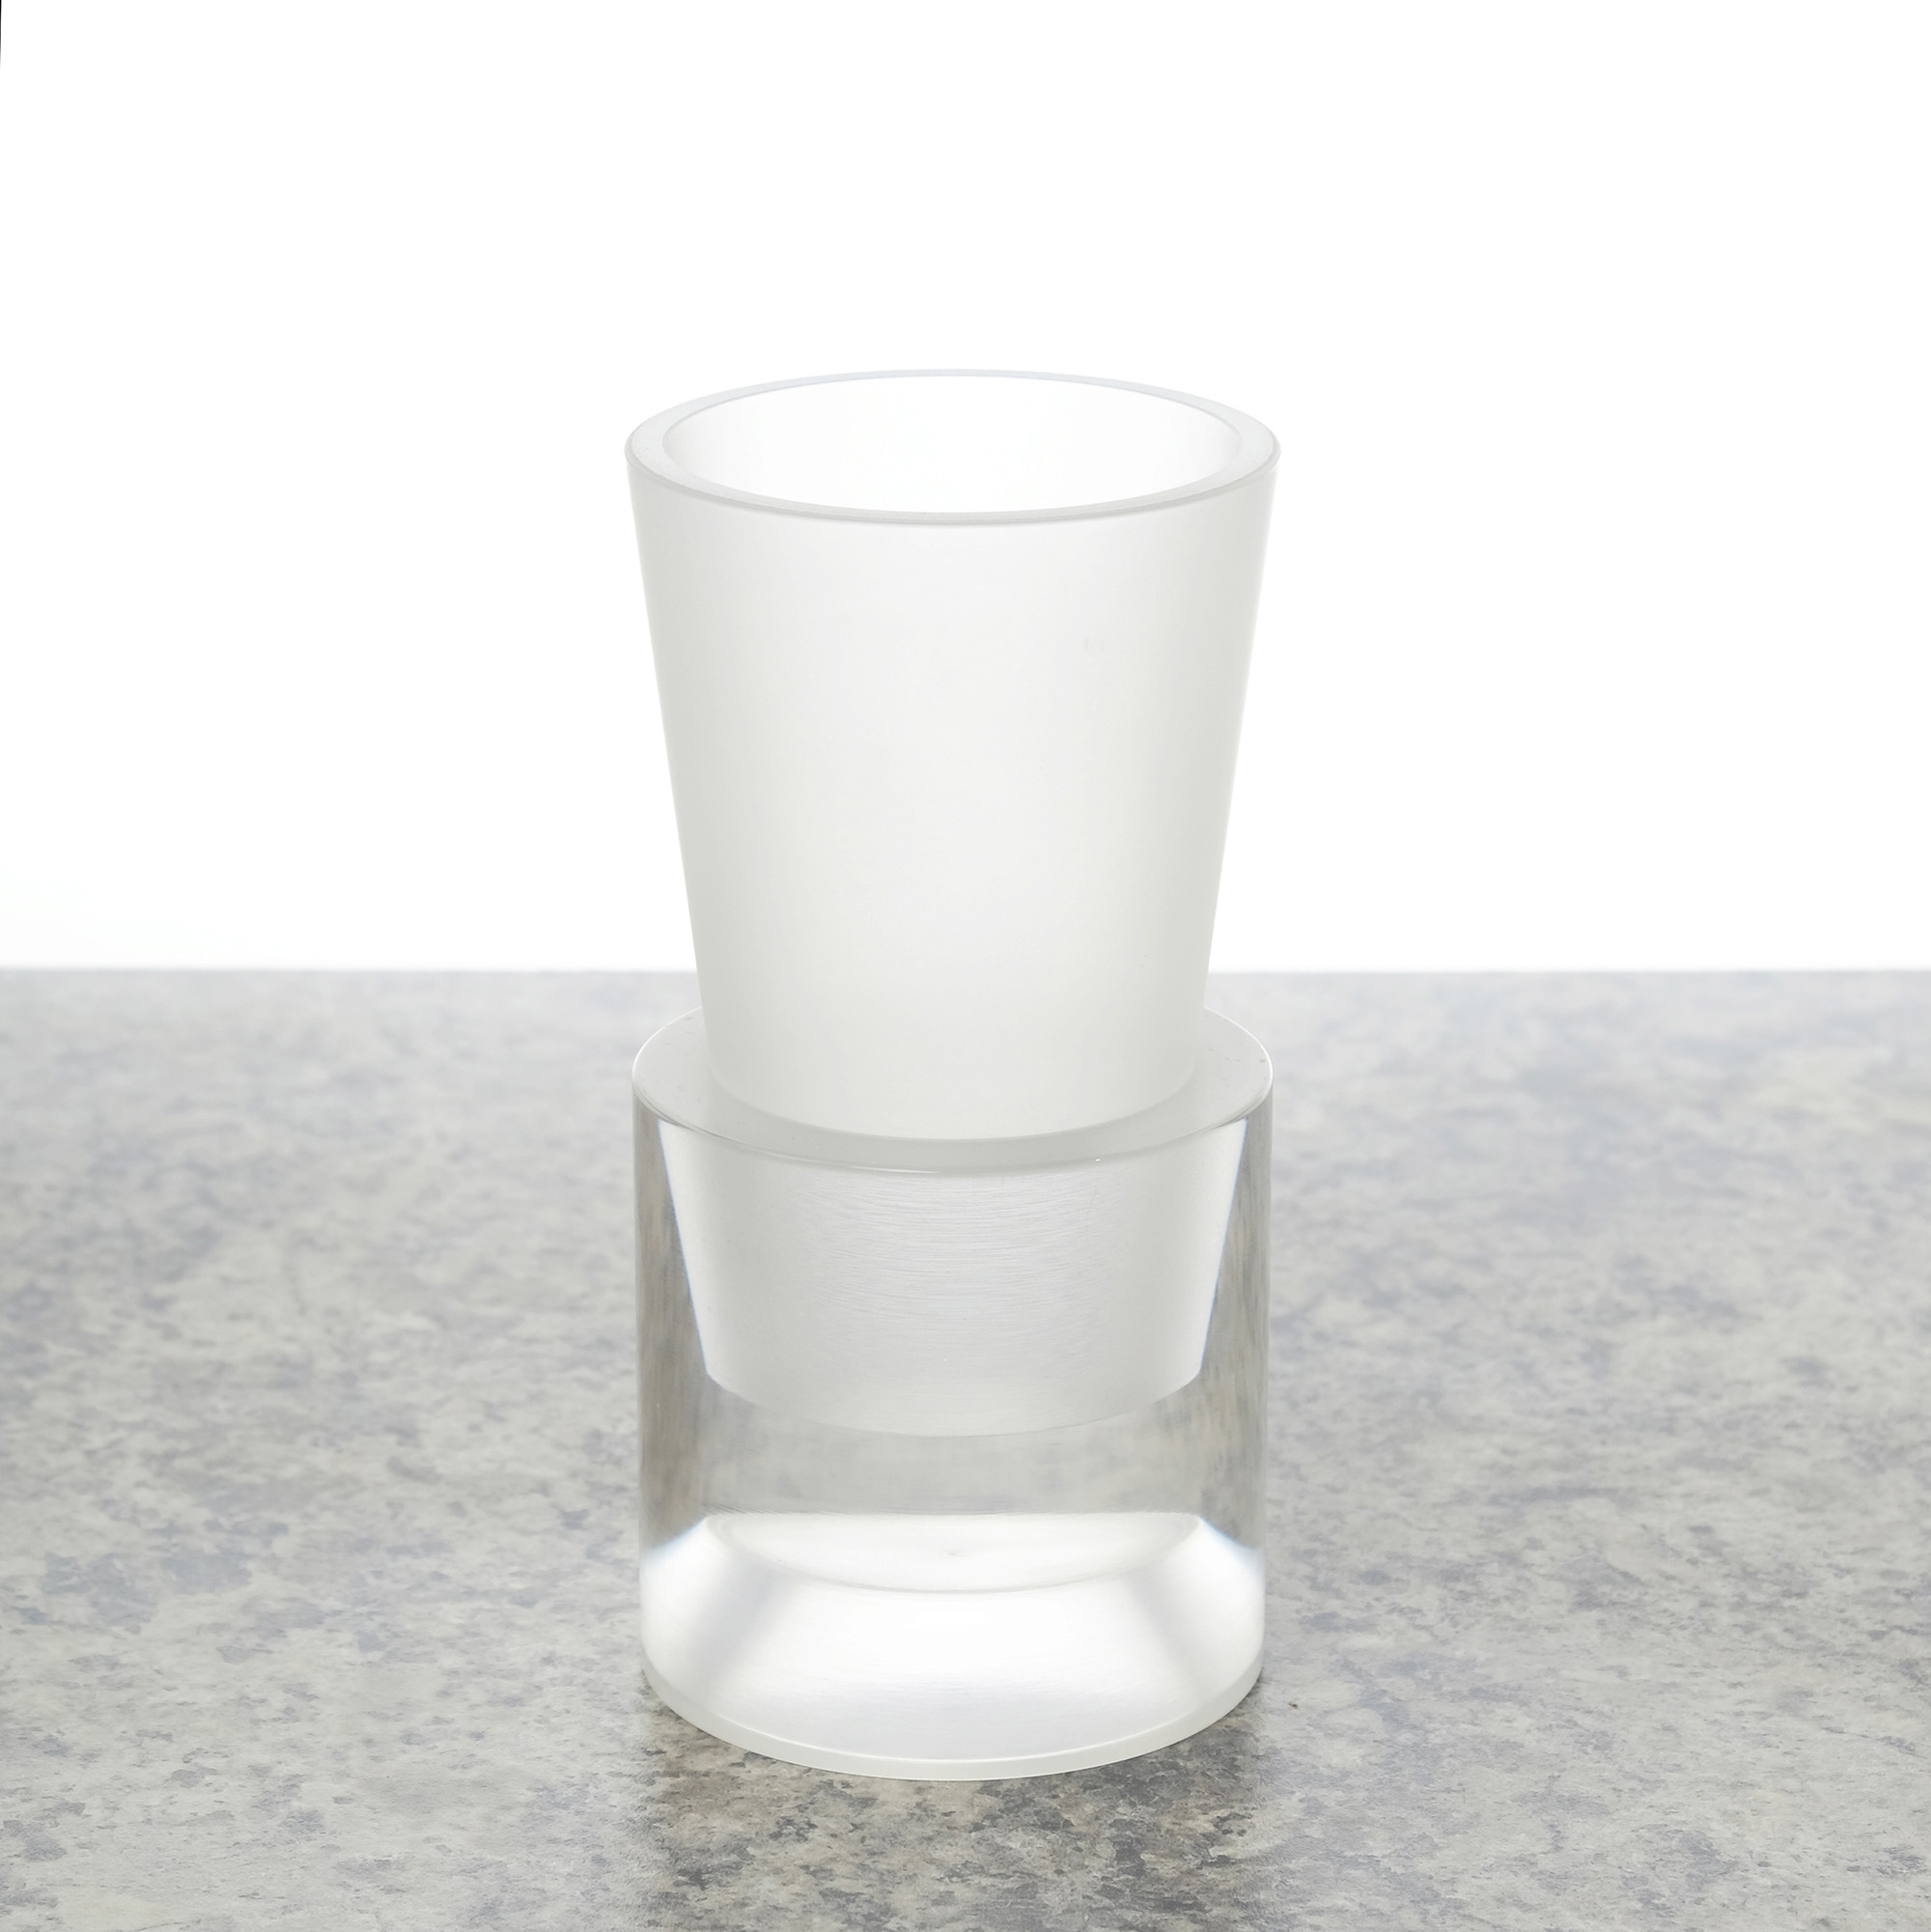 3_2 1 Cup Perspective.jpg